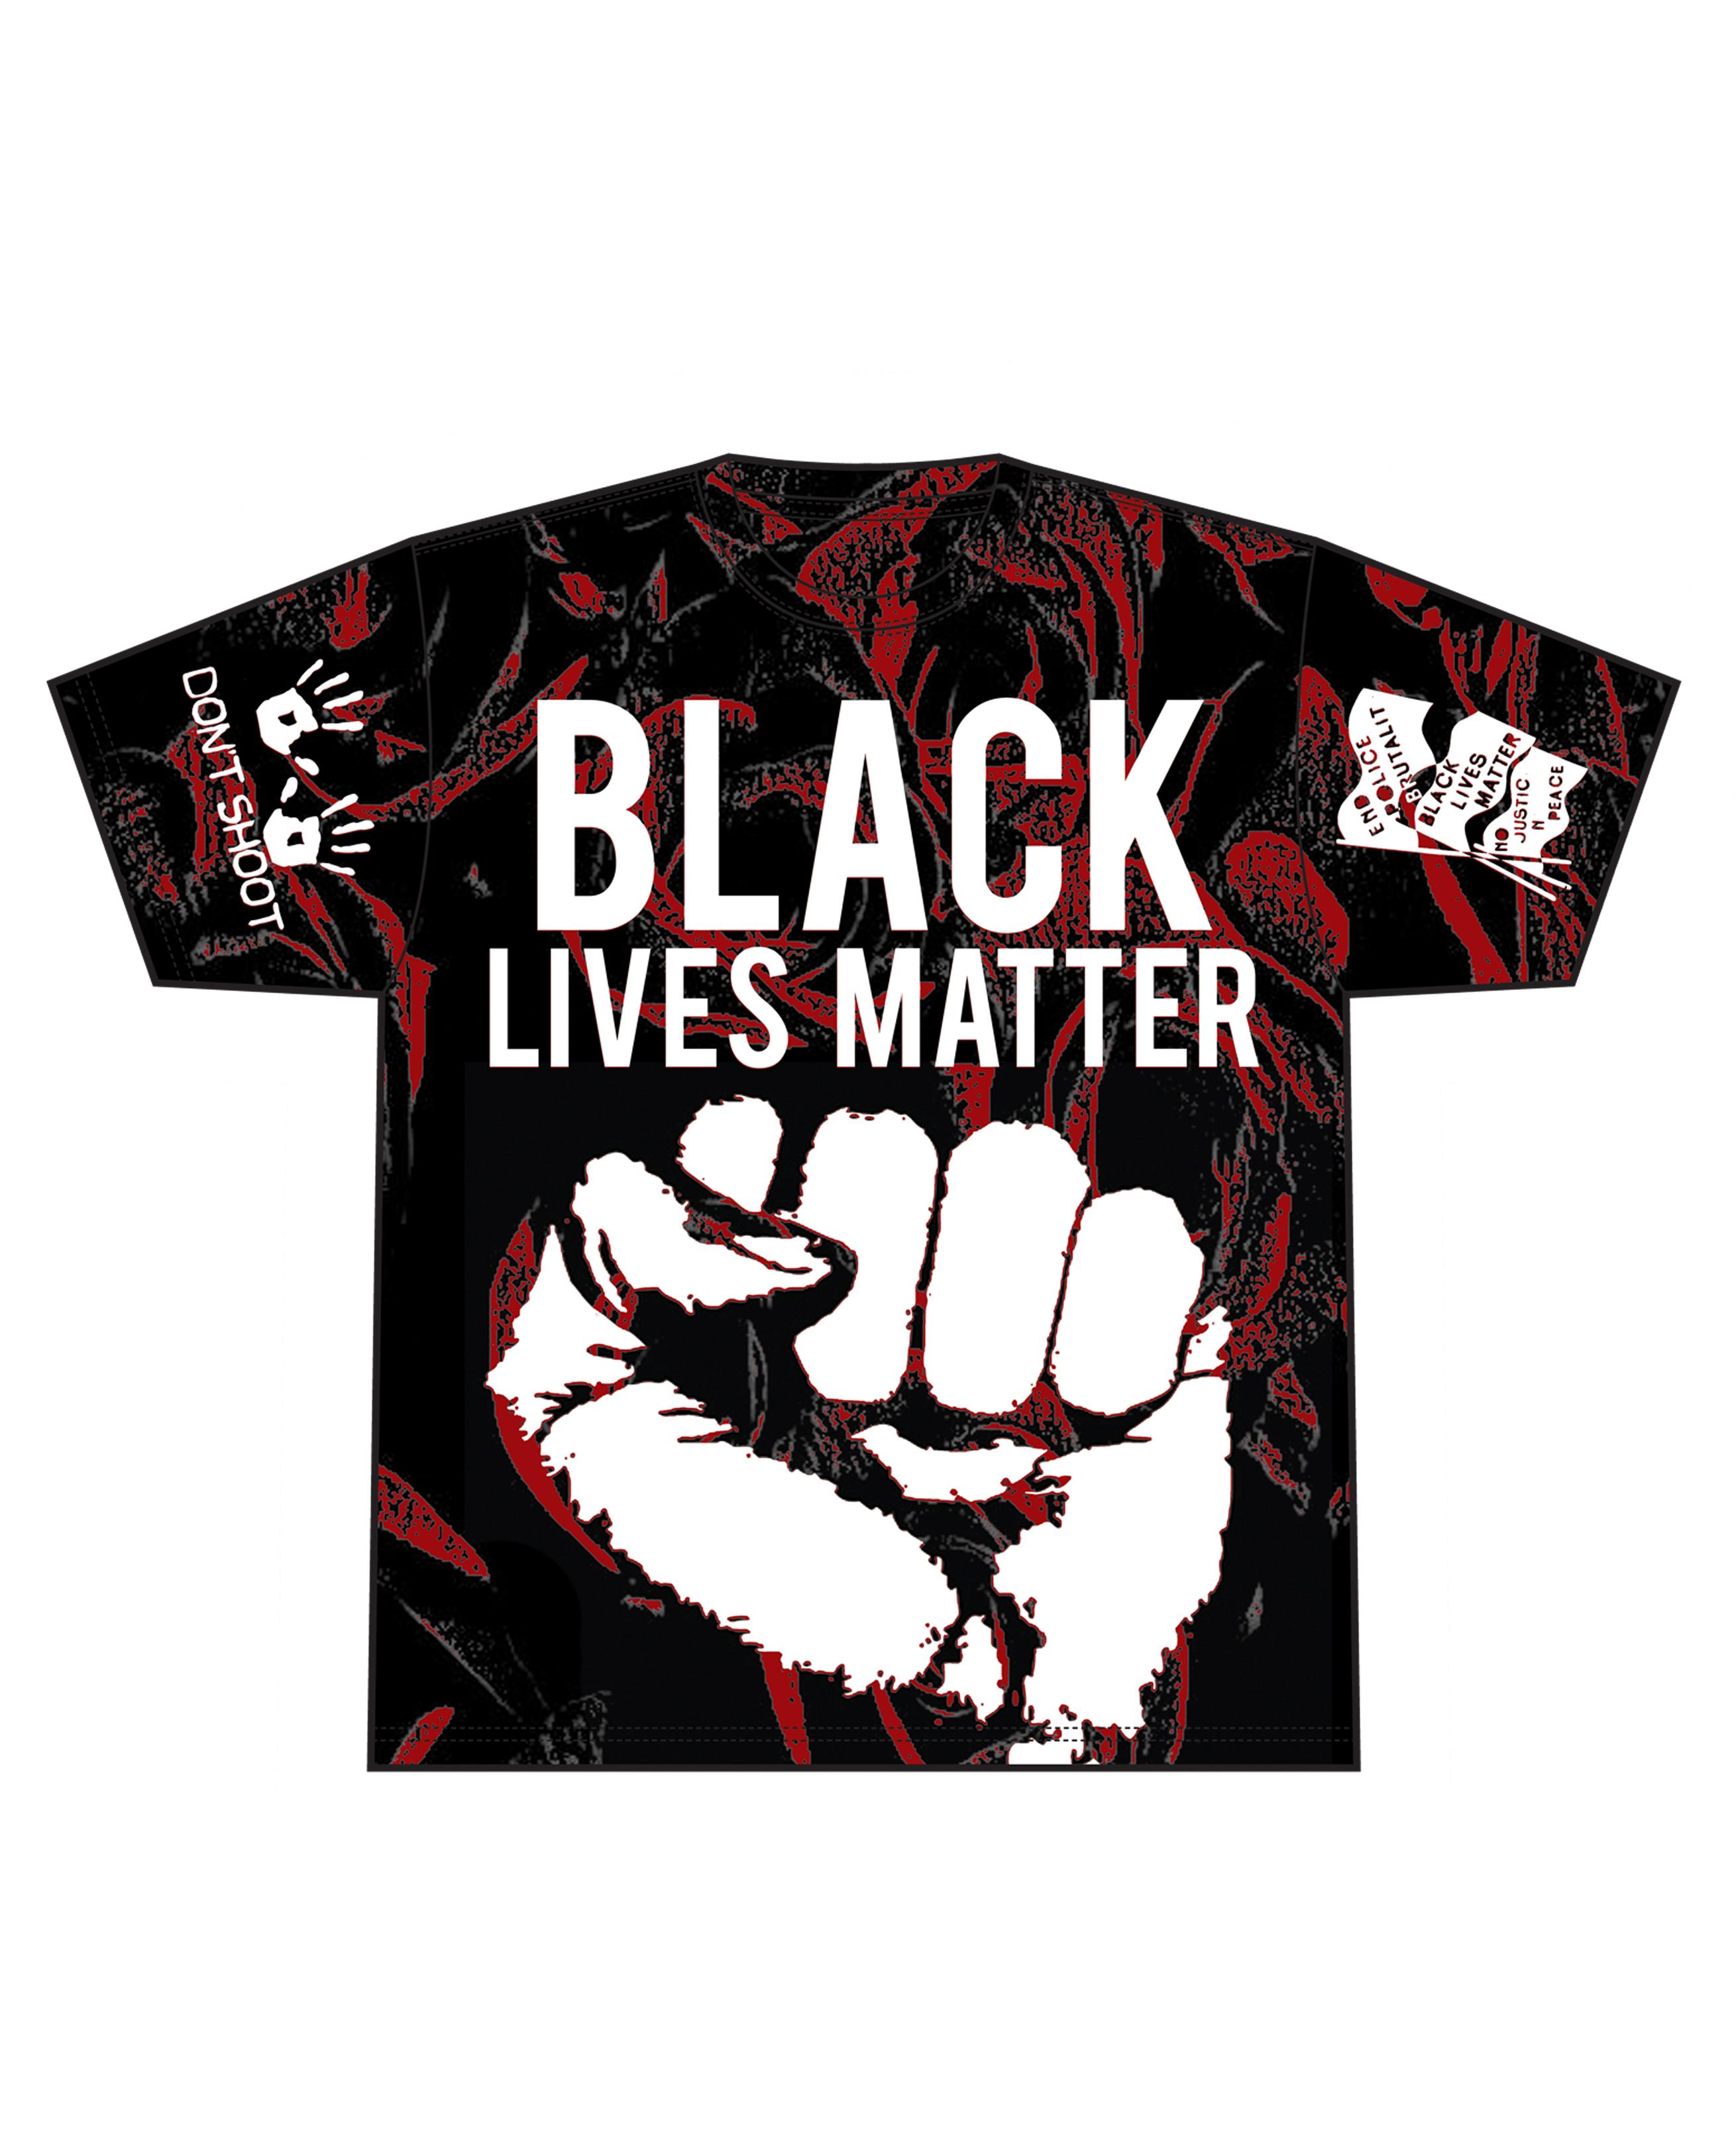 Black Lives Matter – Flag Edition [T-Shirt] – Creators Print House